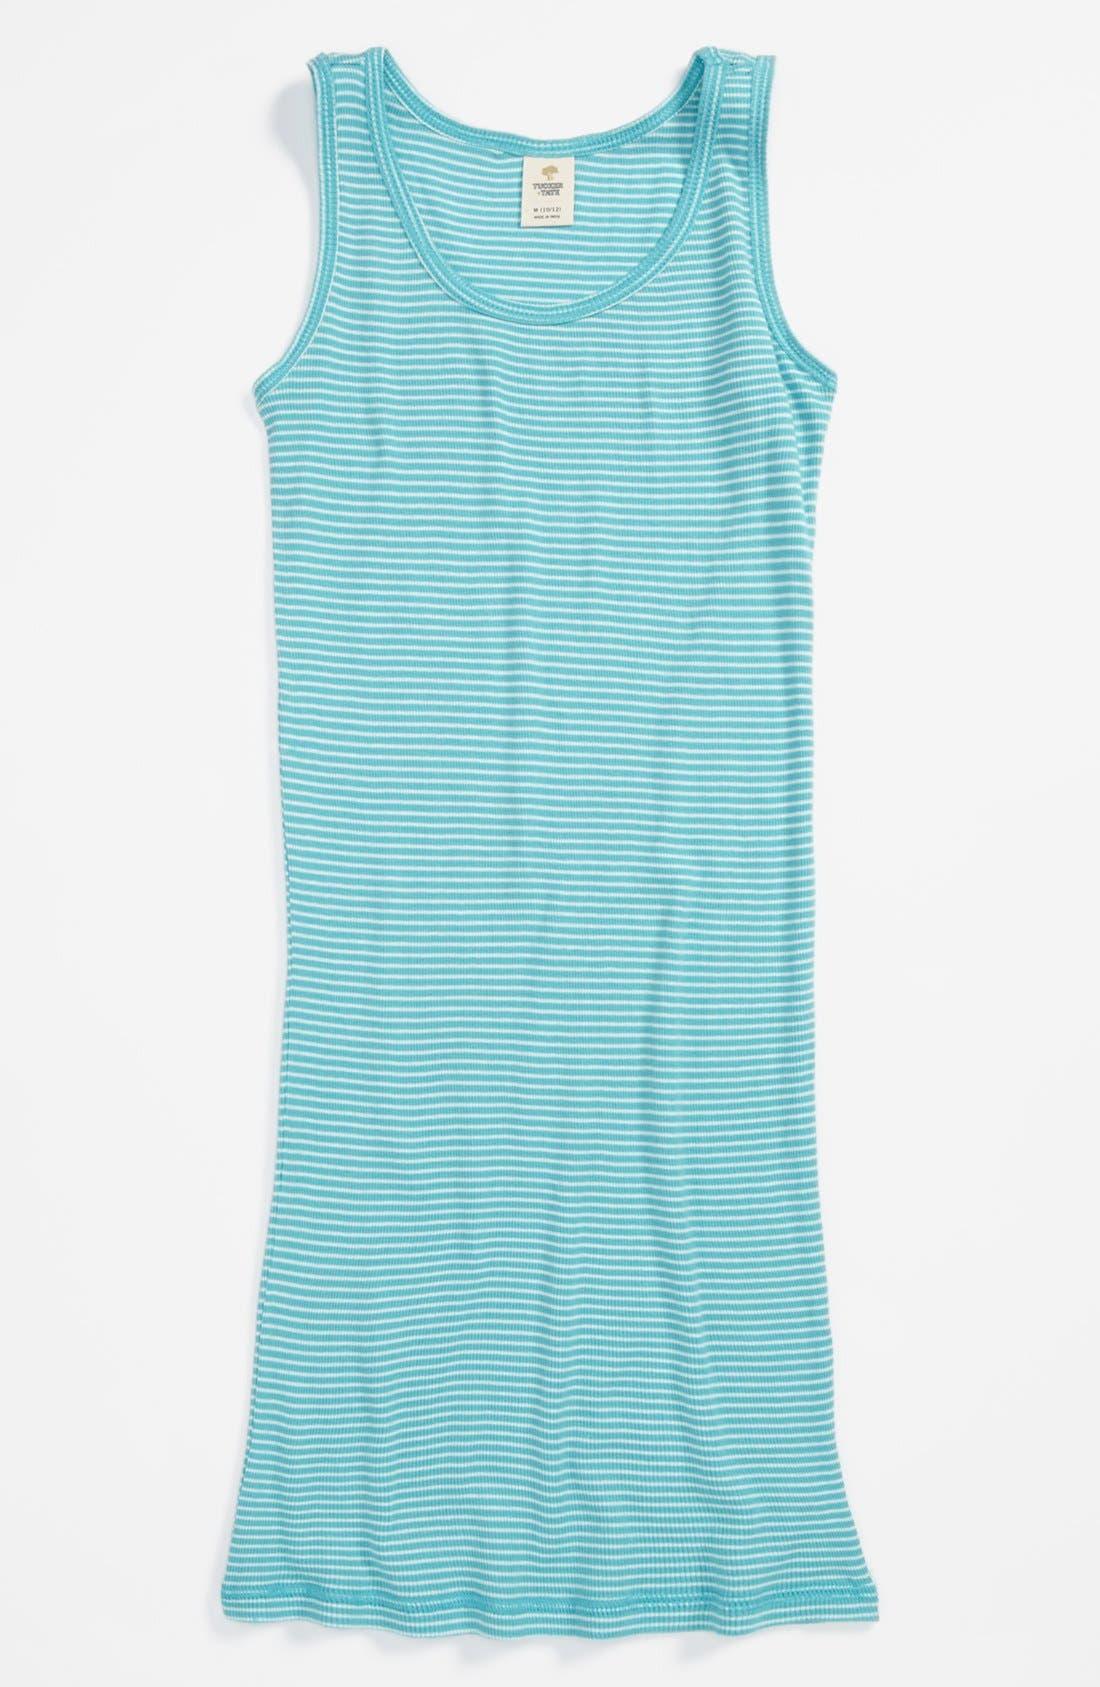 Main Image - Tucker + Tate 'Naomi' Knit Dress (Big Girls)